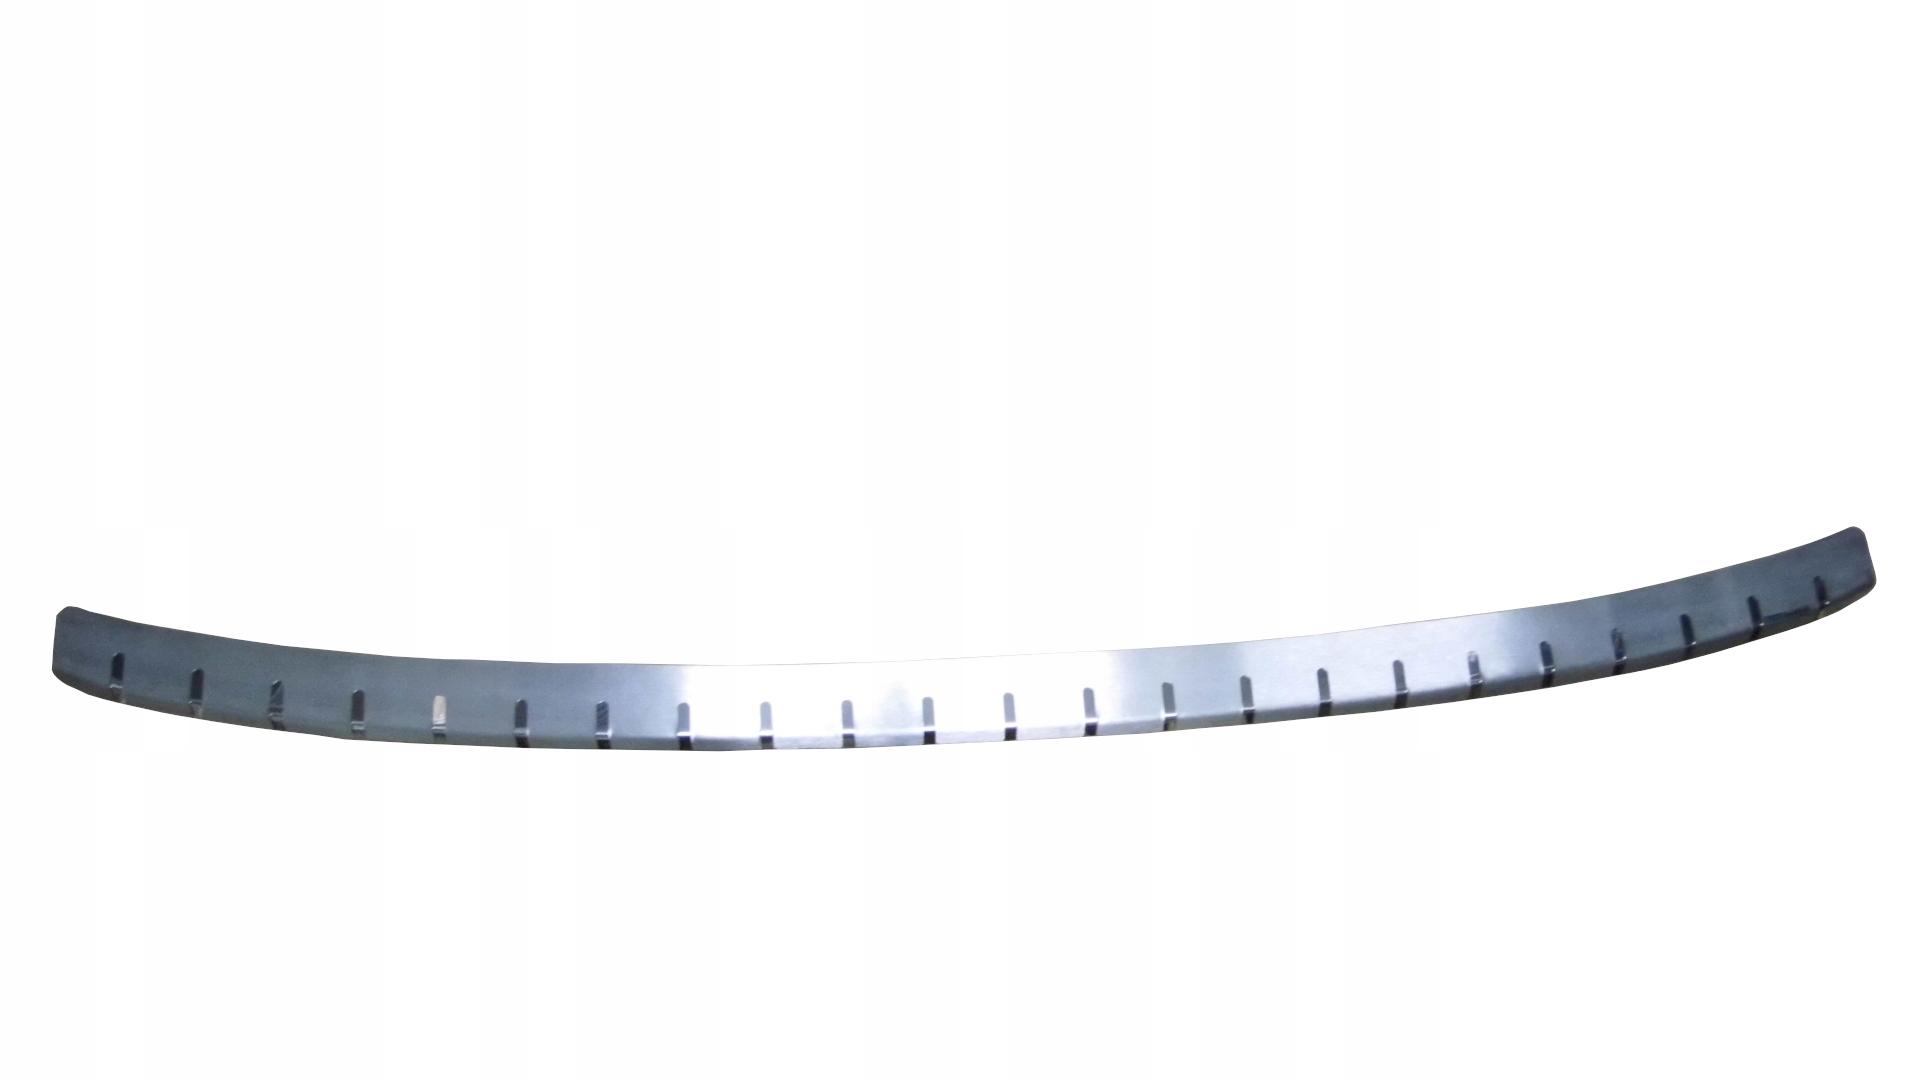 накладка на задняя панель бампер ford focus mk3 универсал